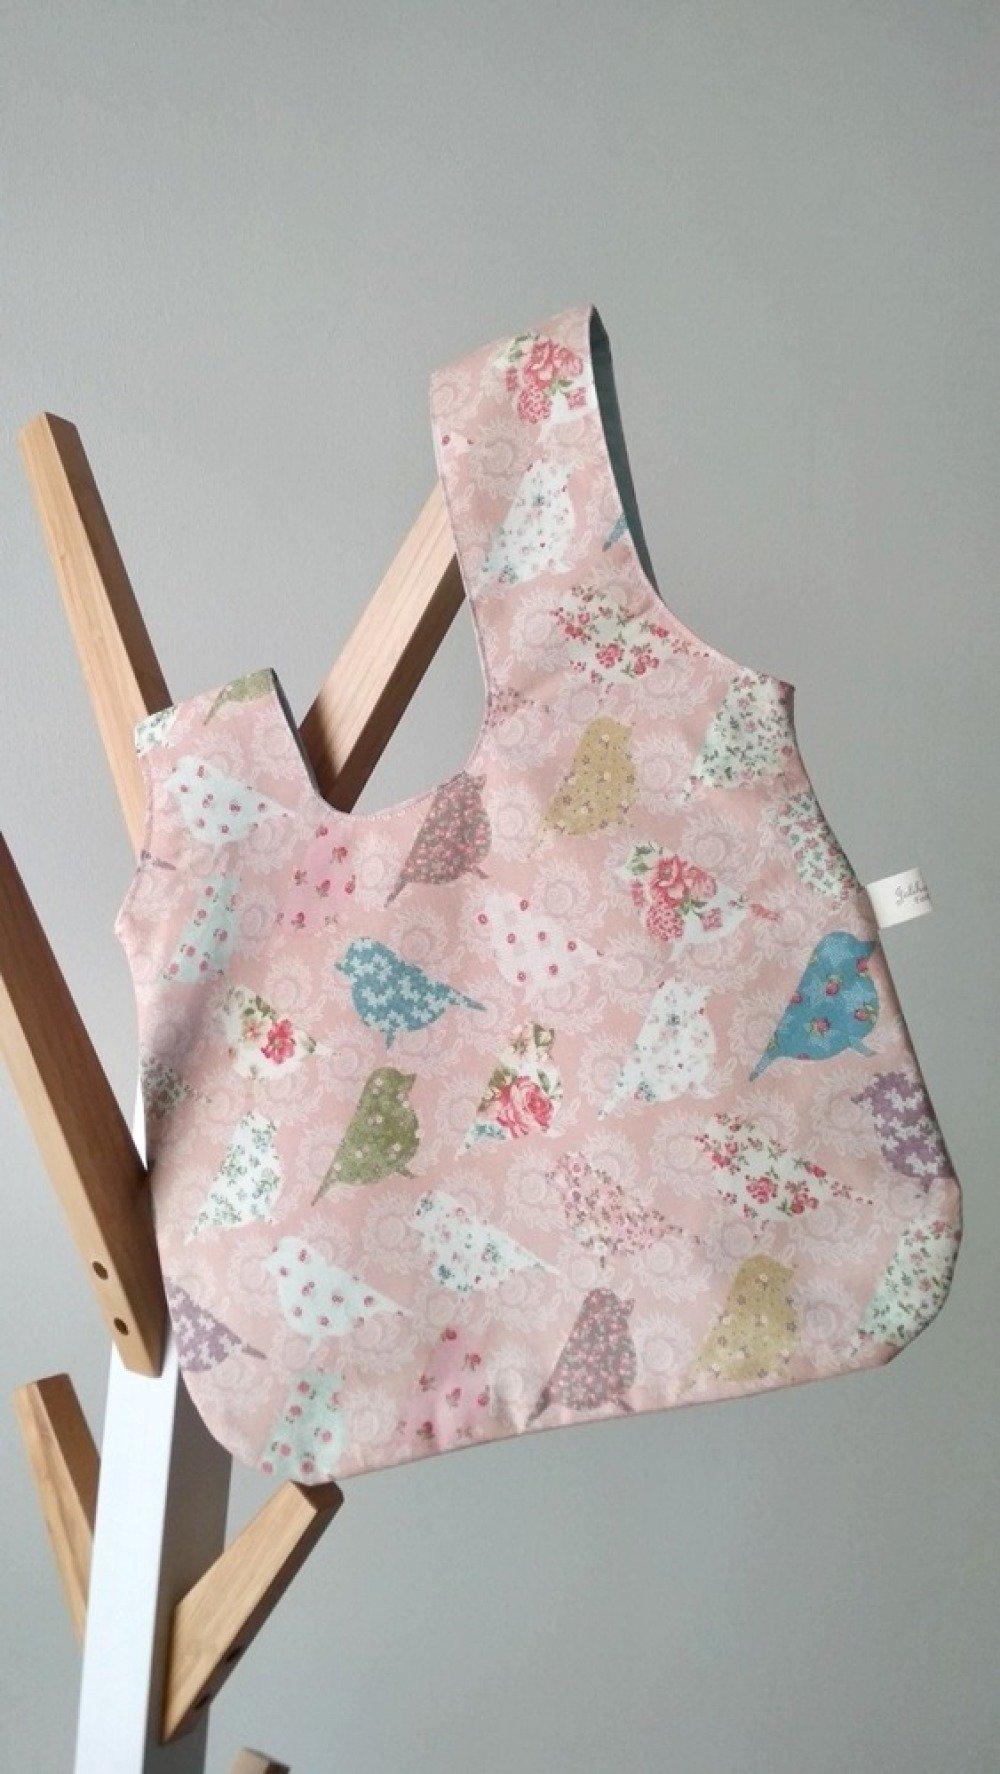 SAC POCHETTE 'One-Knot bag' - Oiseaux roses